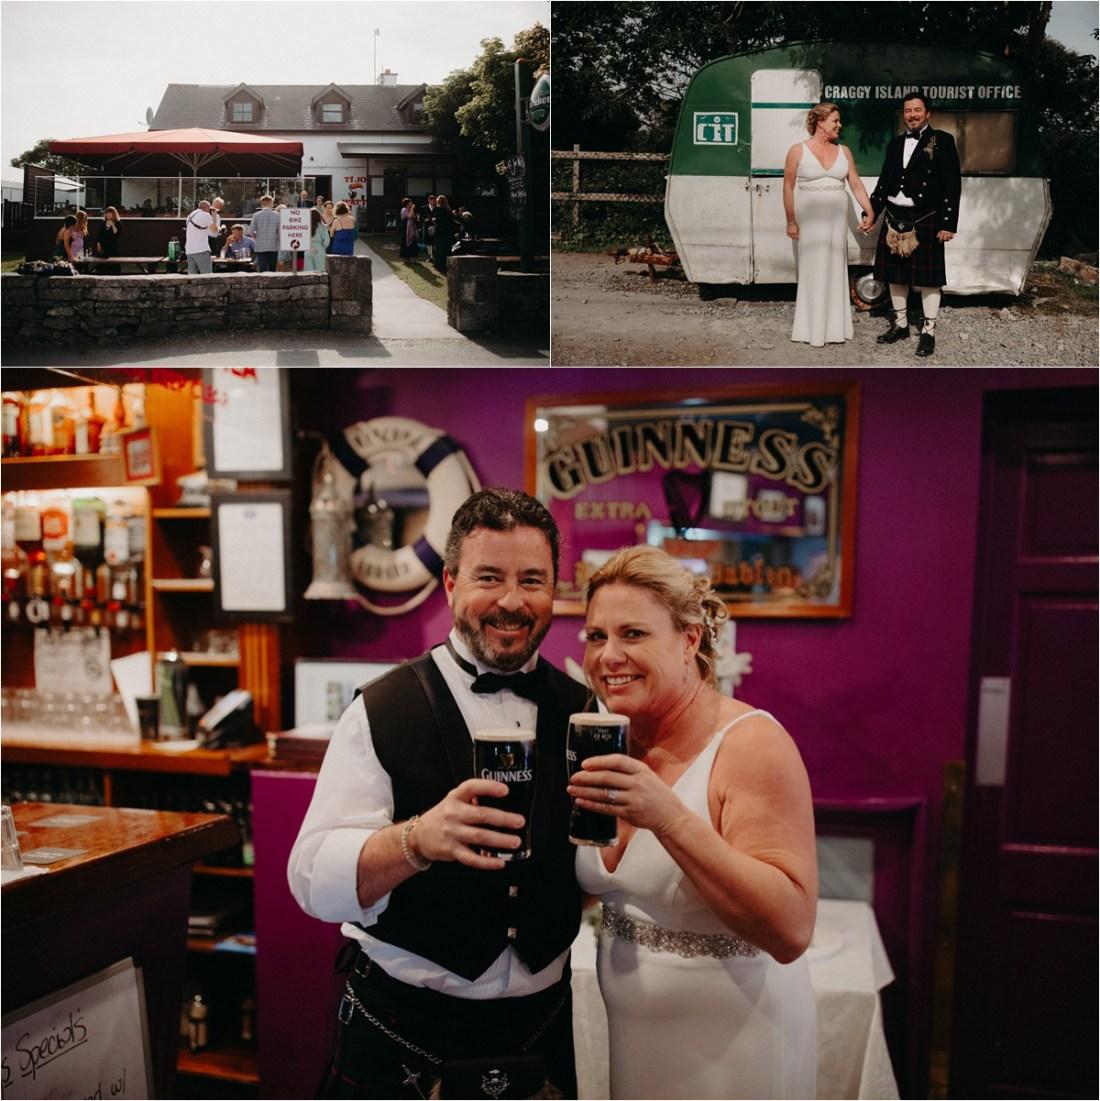 Aran Islands wedding reception. Photos by Sean & Kate